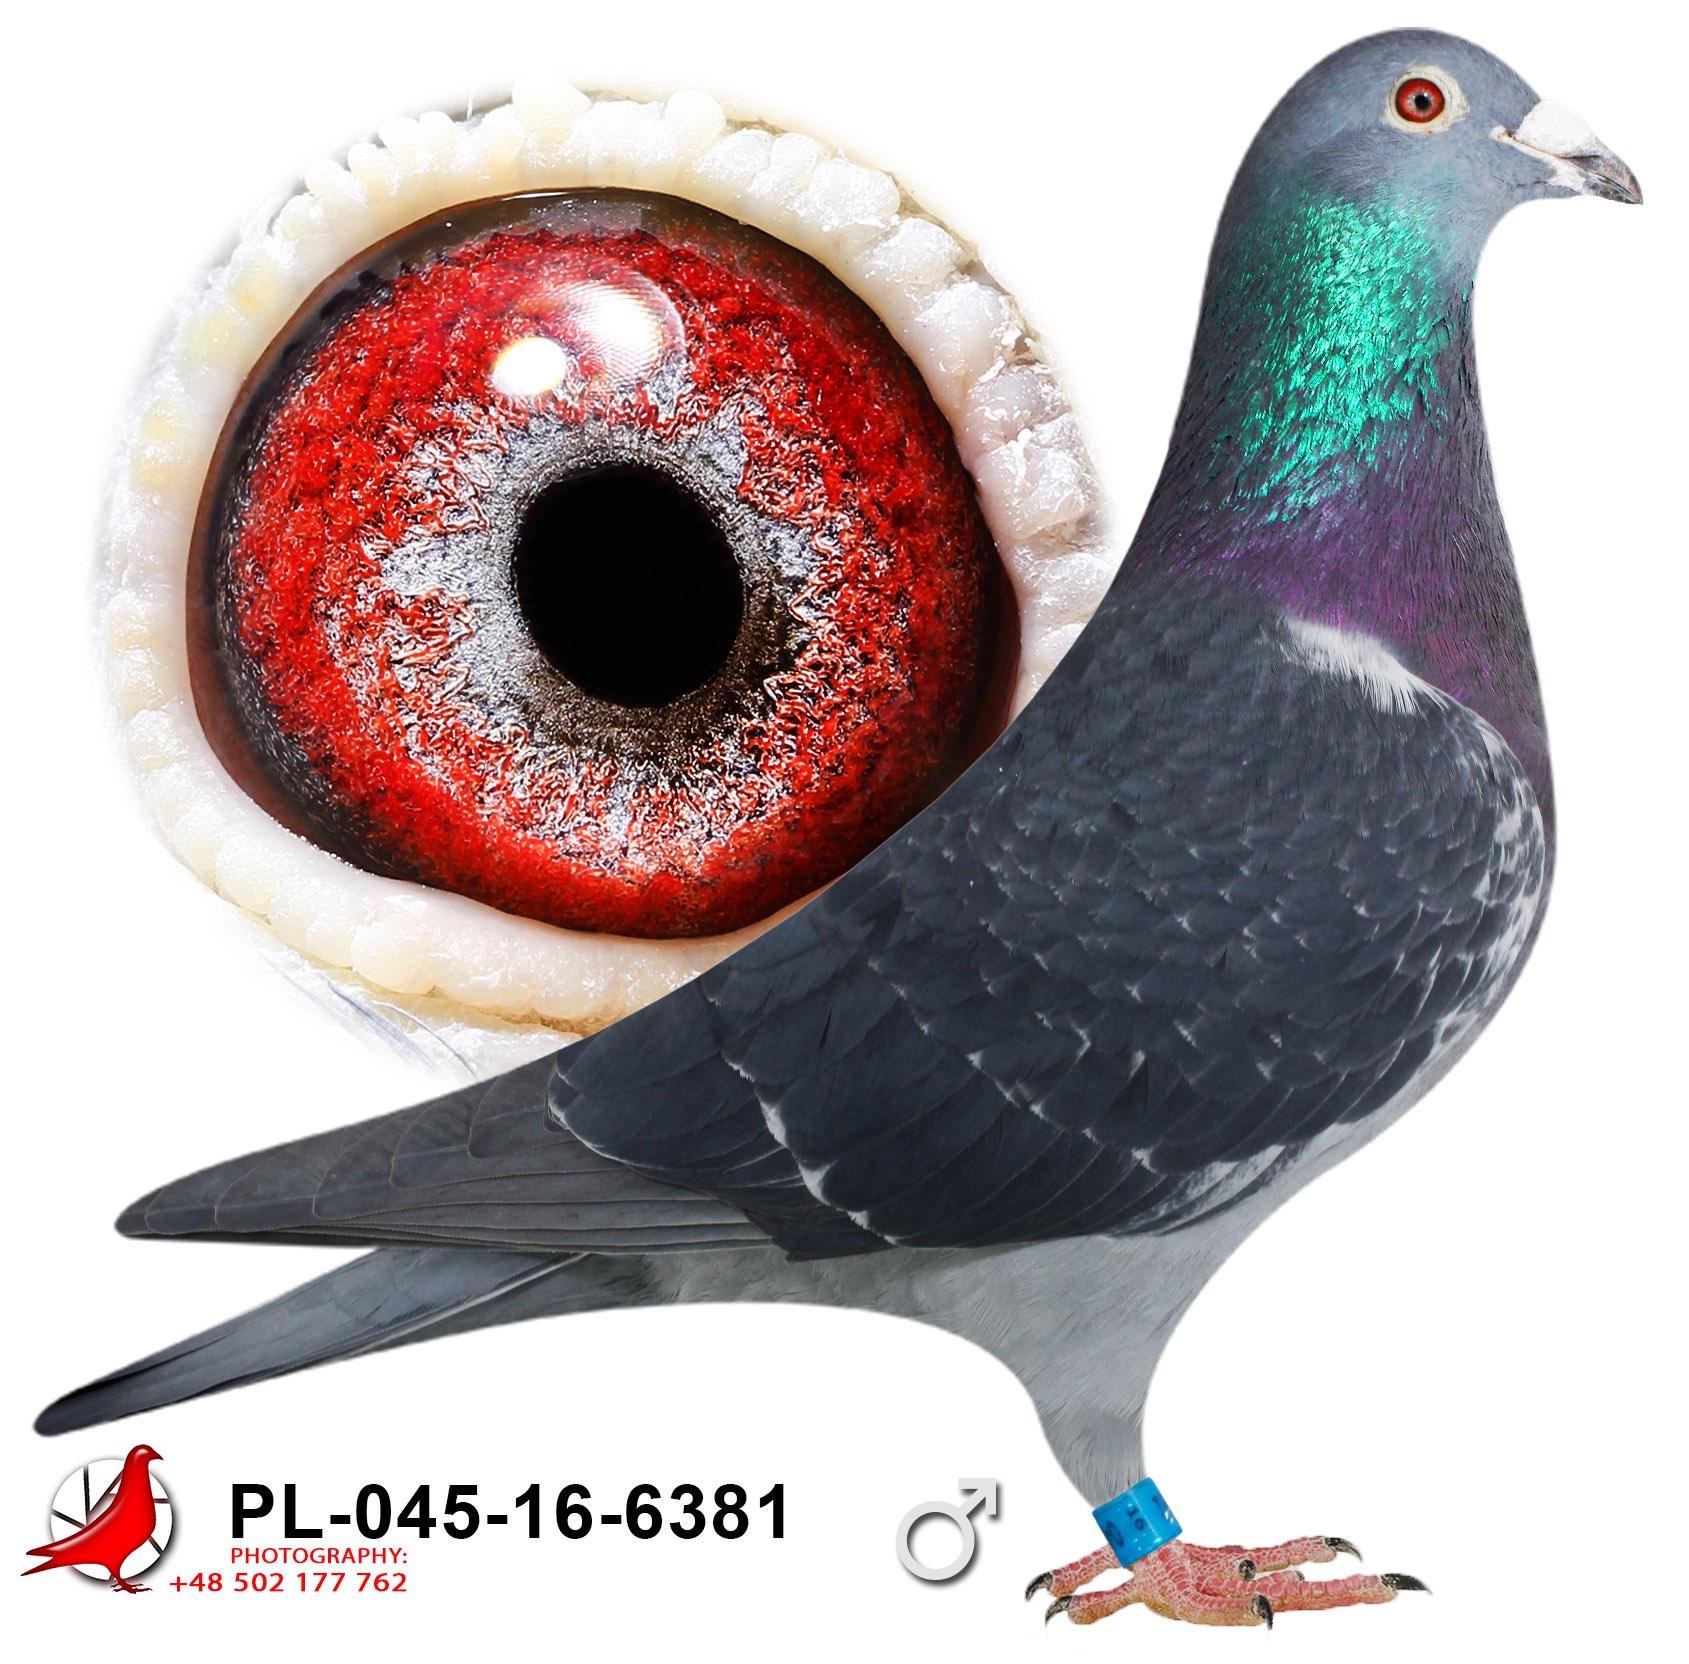 pl-045-16-6381_c (1)